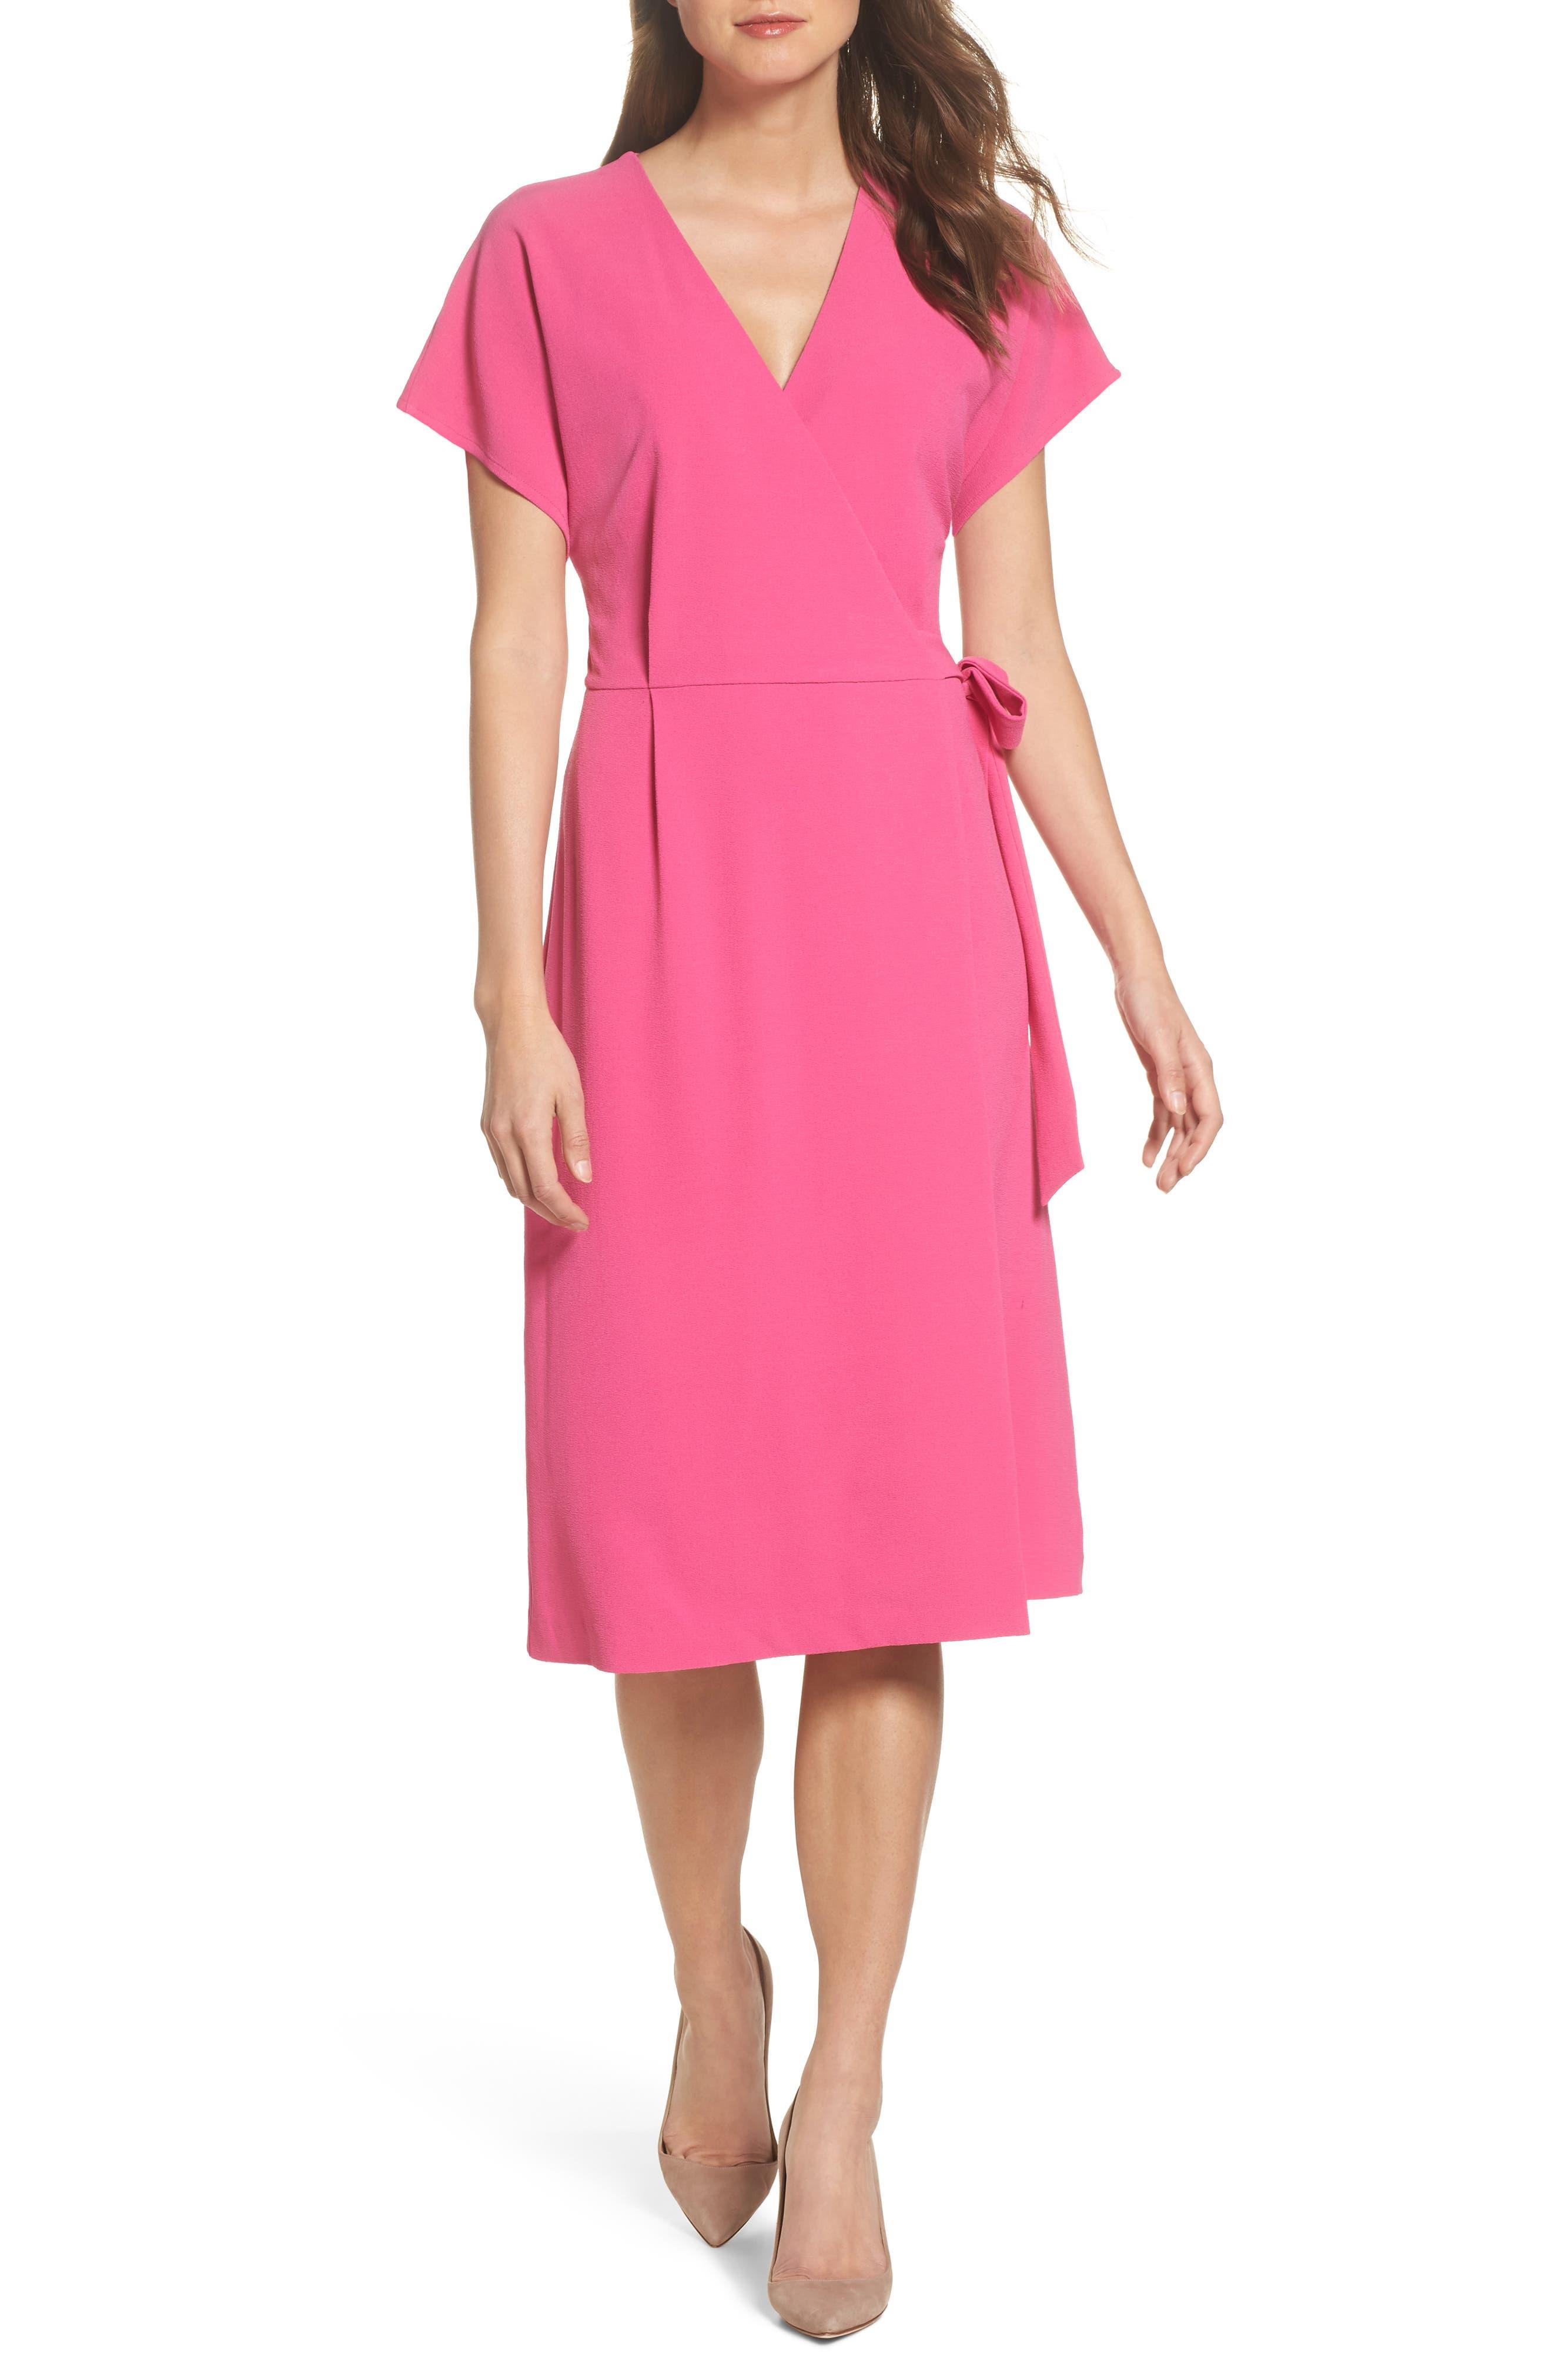 Main Image - Felicity & Coco Rita Wrap Dress (Regular & Petite) (Nordstrom Exclusive)